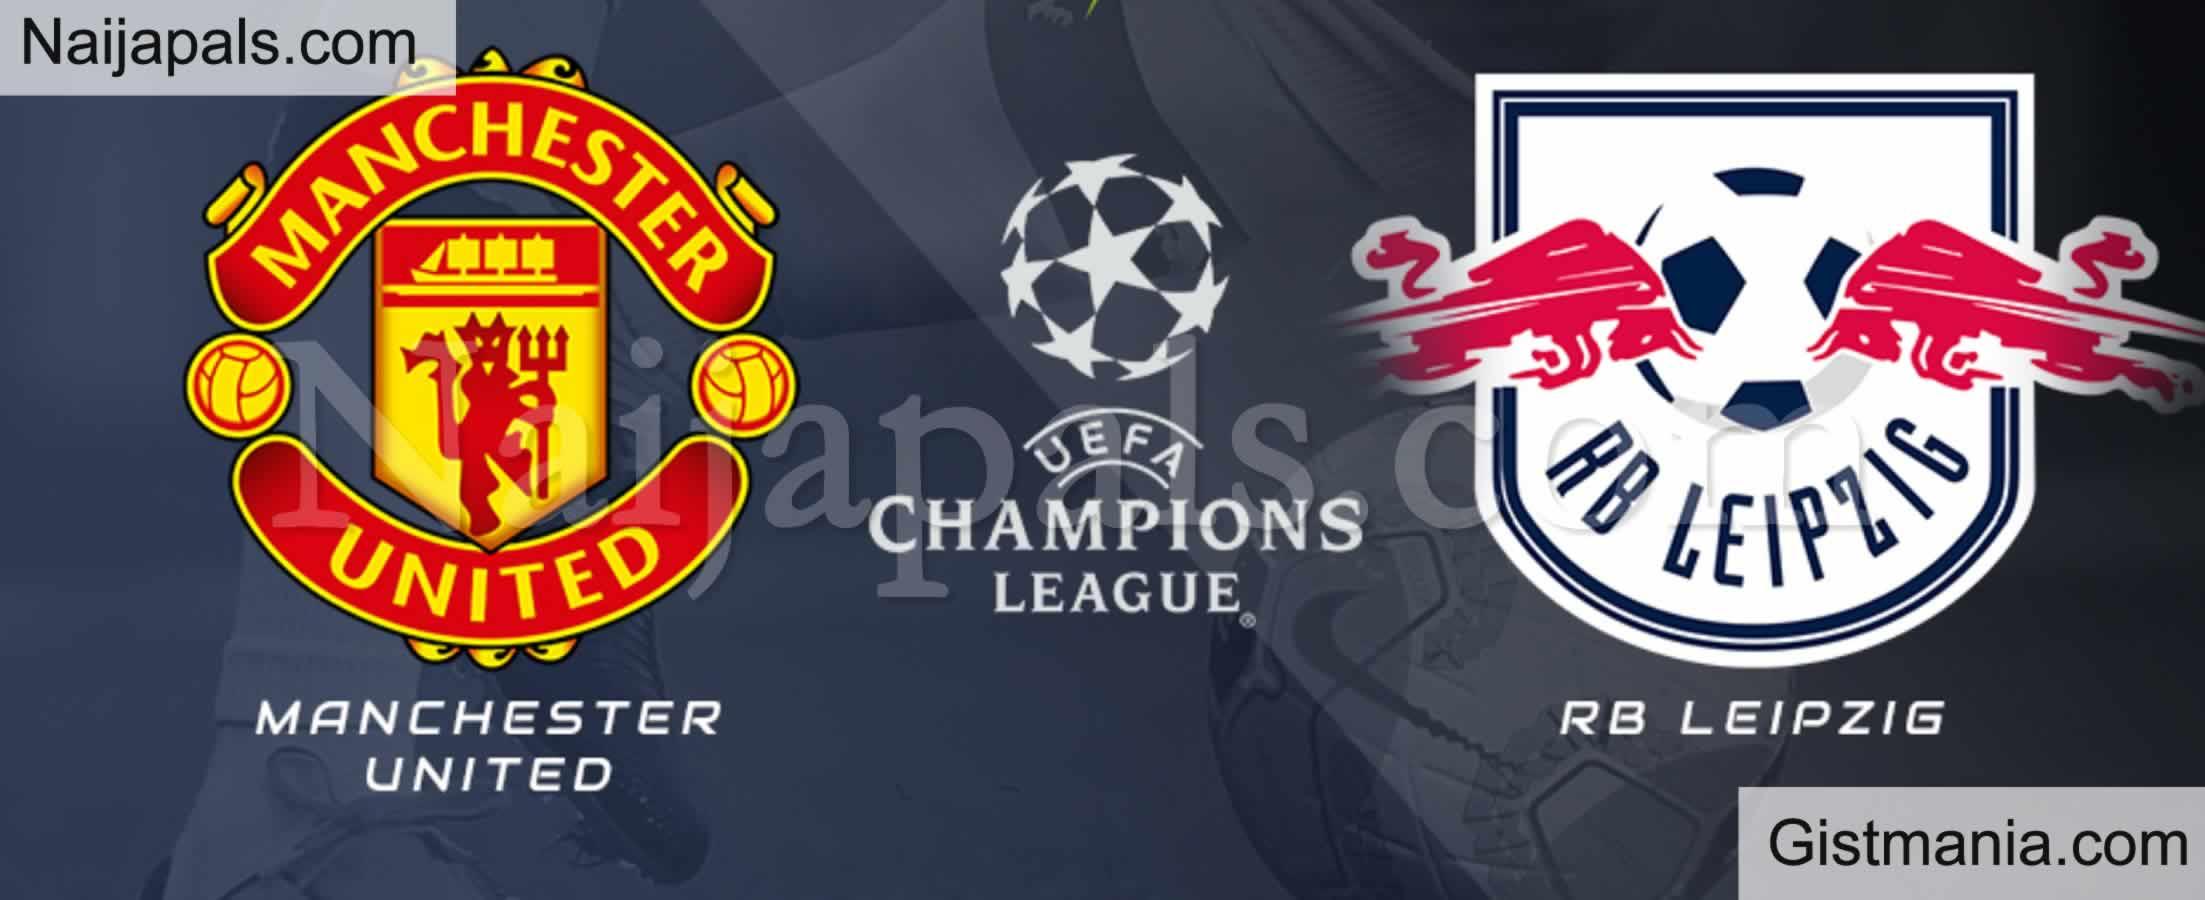 <img alt='.' class='lazyload' data-src='https://img.gistmania.com/emot/soccer.gif' /> <b>Manchester United v RB Leipzig : UEFA Champions League Match, Team News, Goal Scorers and Stats</b>